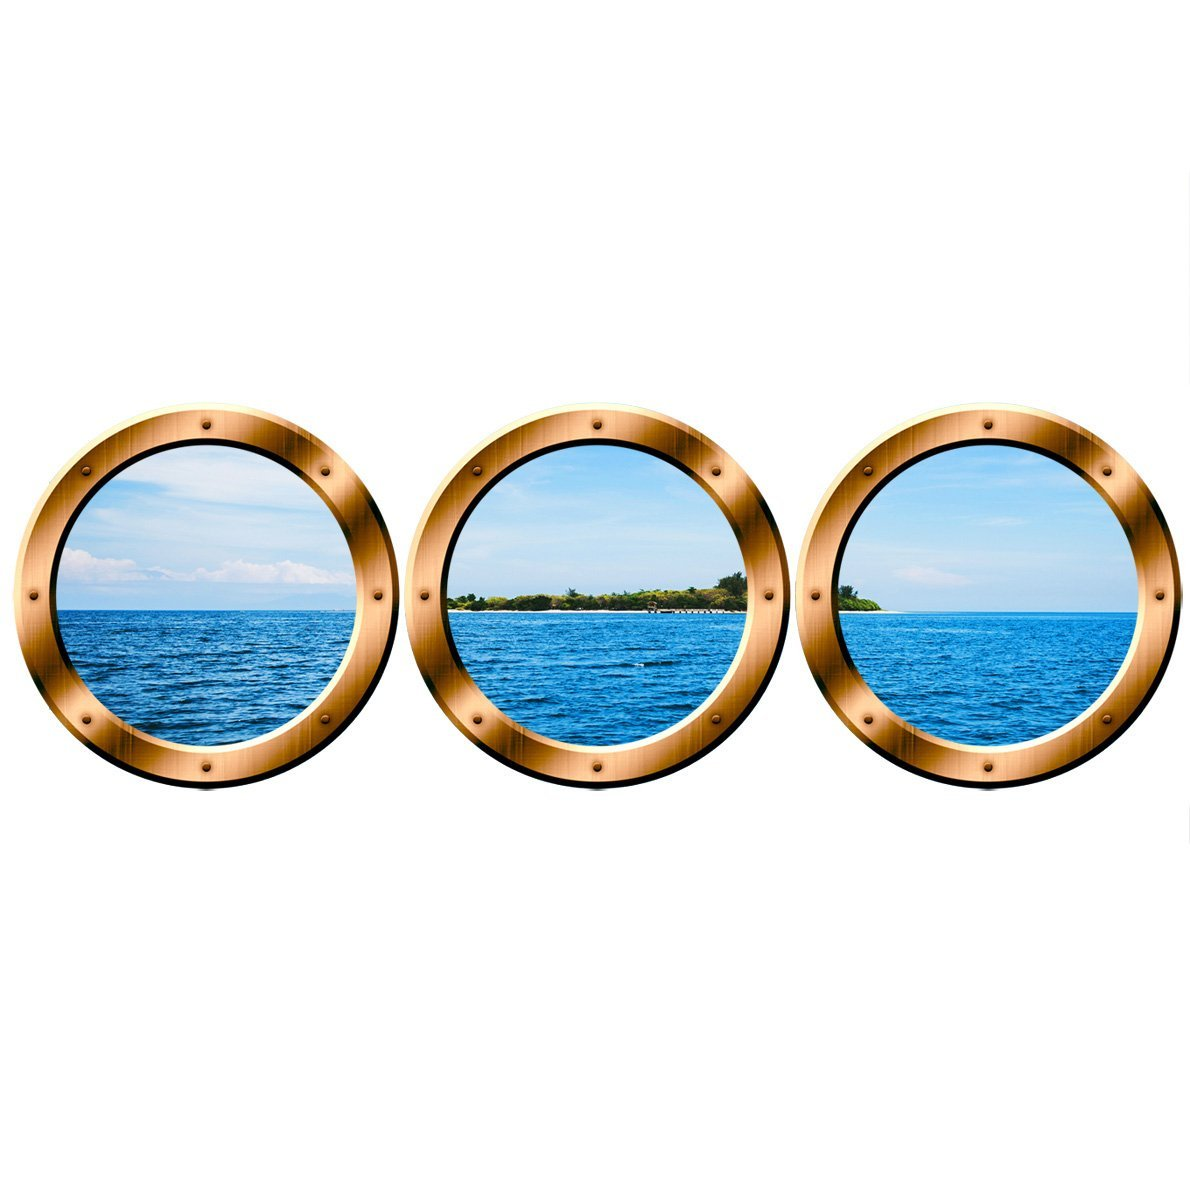 "VWAQ Scenic Ocean Sticker / PORTHOLES - Tropical Island Wall Decor - VWAQ-SPW4 (20"" Variation, Bronze)"